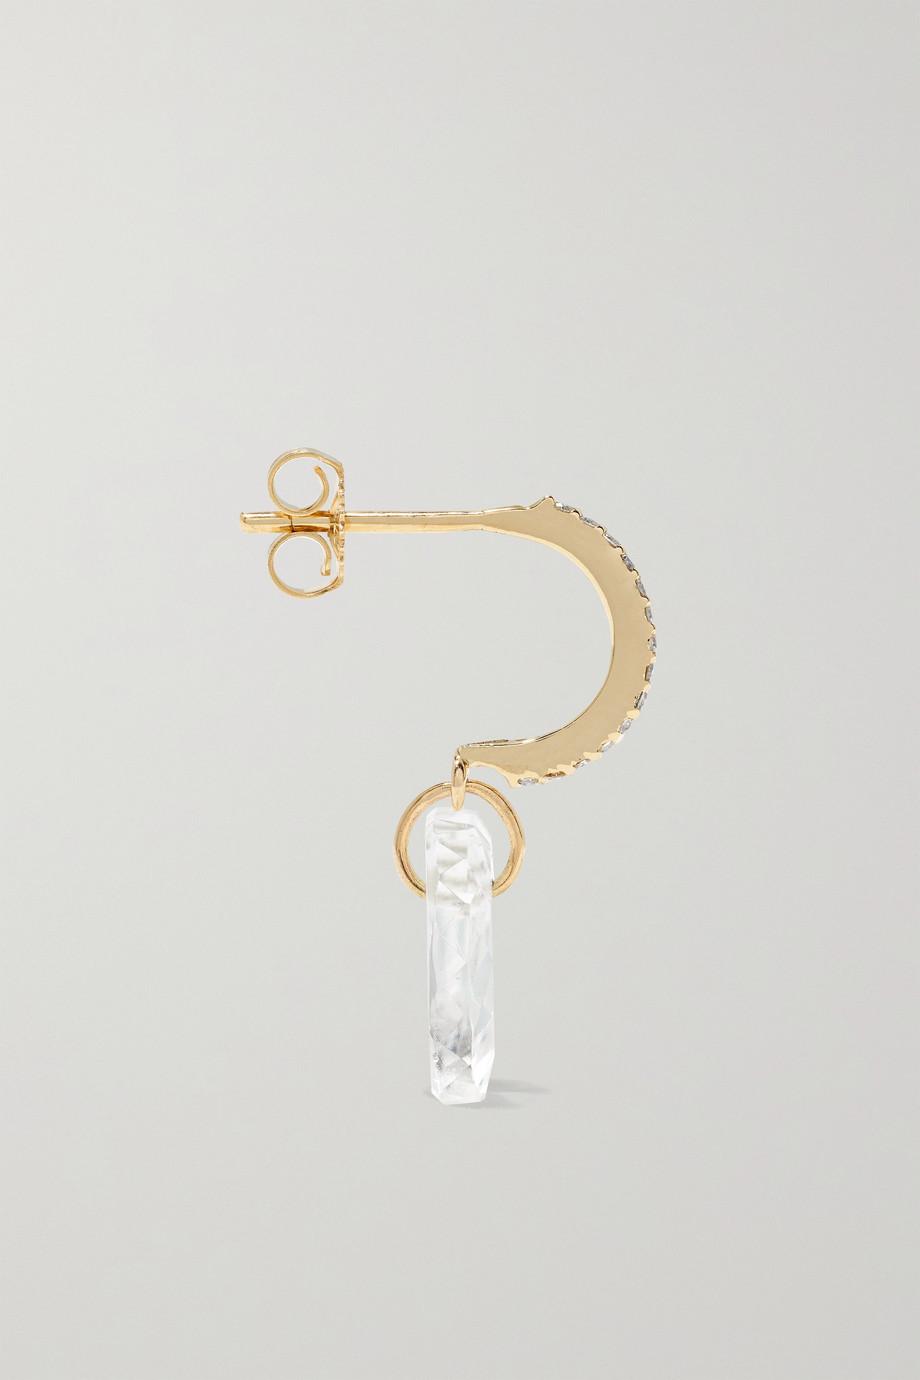 Pascale Monvoisin Gabin N°1 9-karat gold, crystal and diamond earring